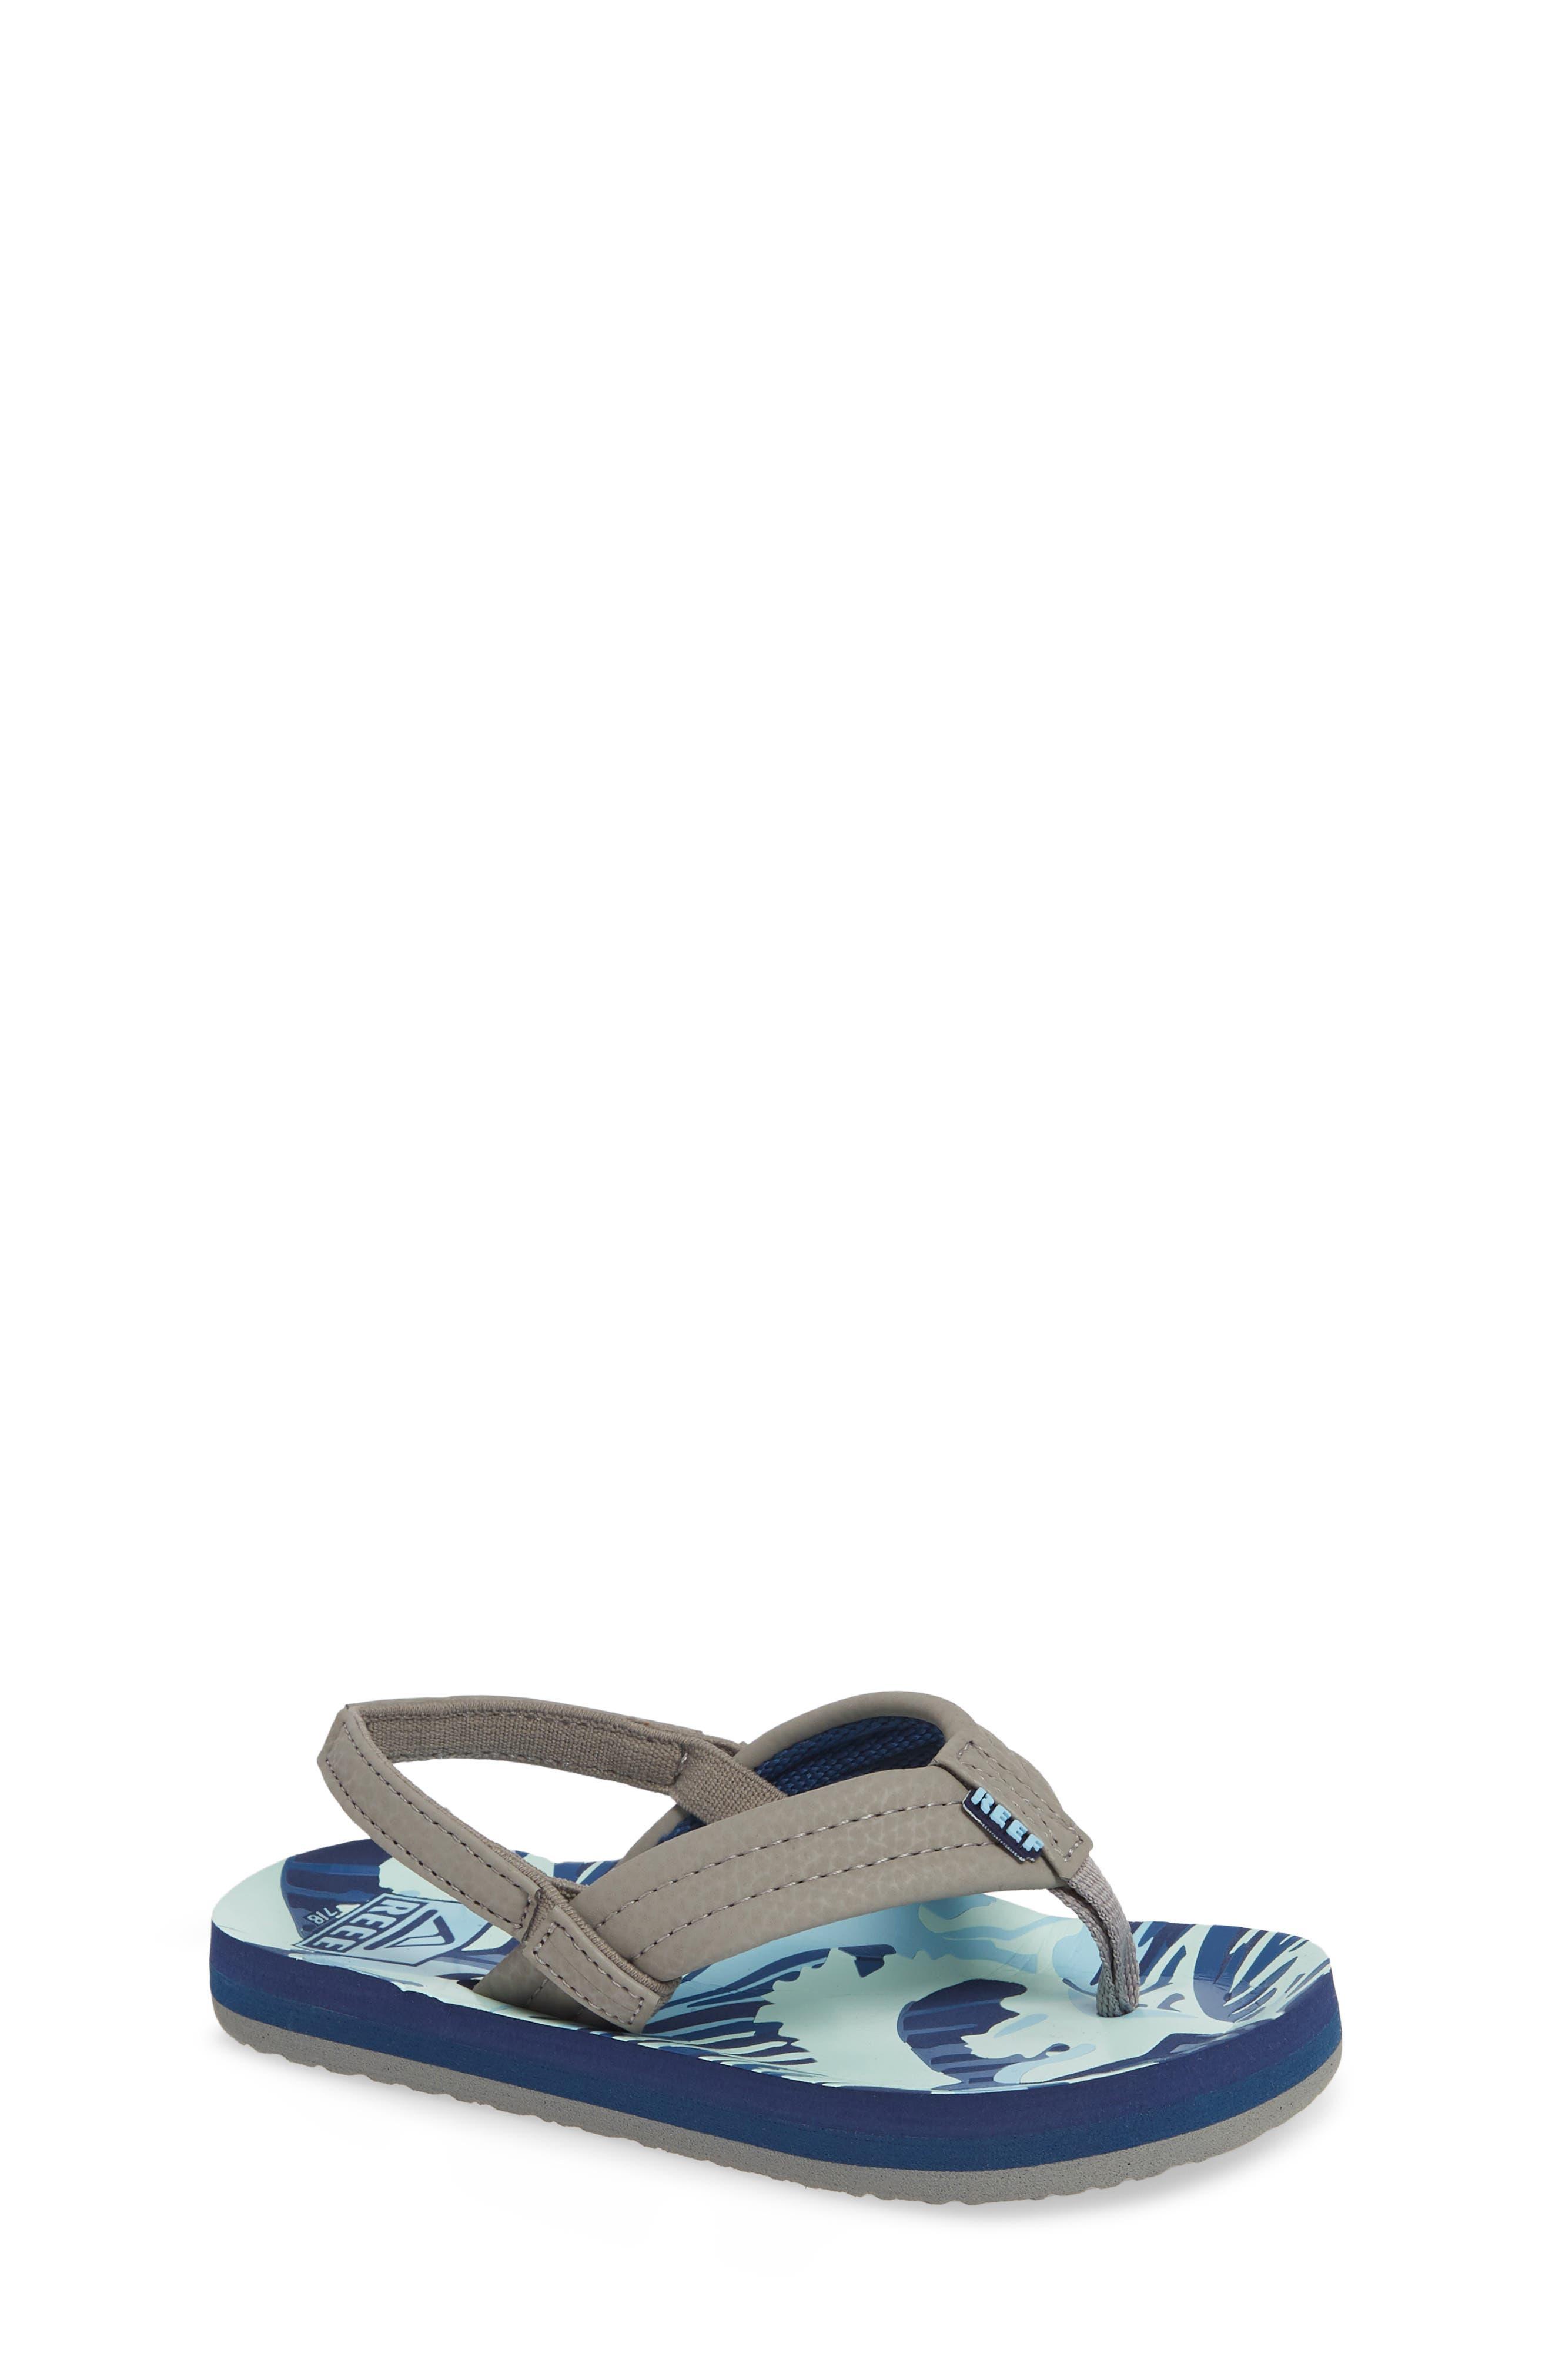 'Ahi' Sandal,                             Main thumbnail 1, color,                             BLUE